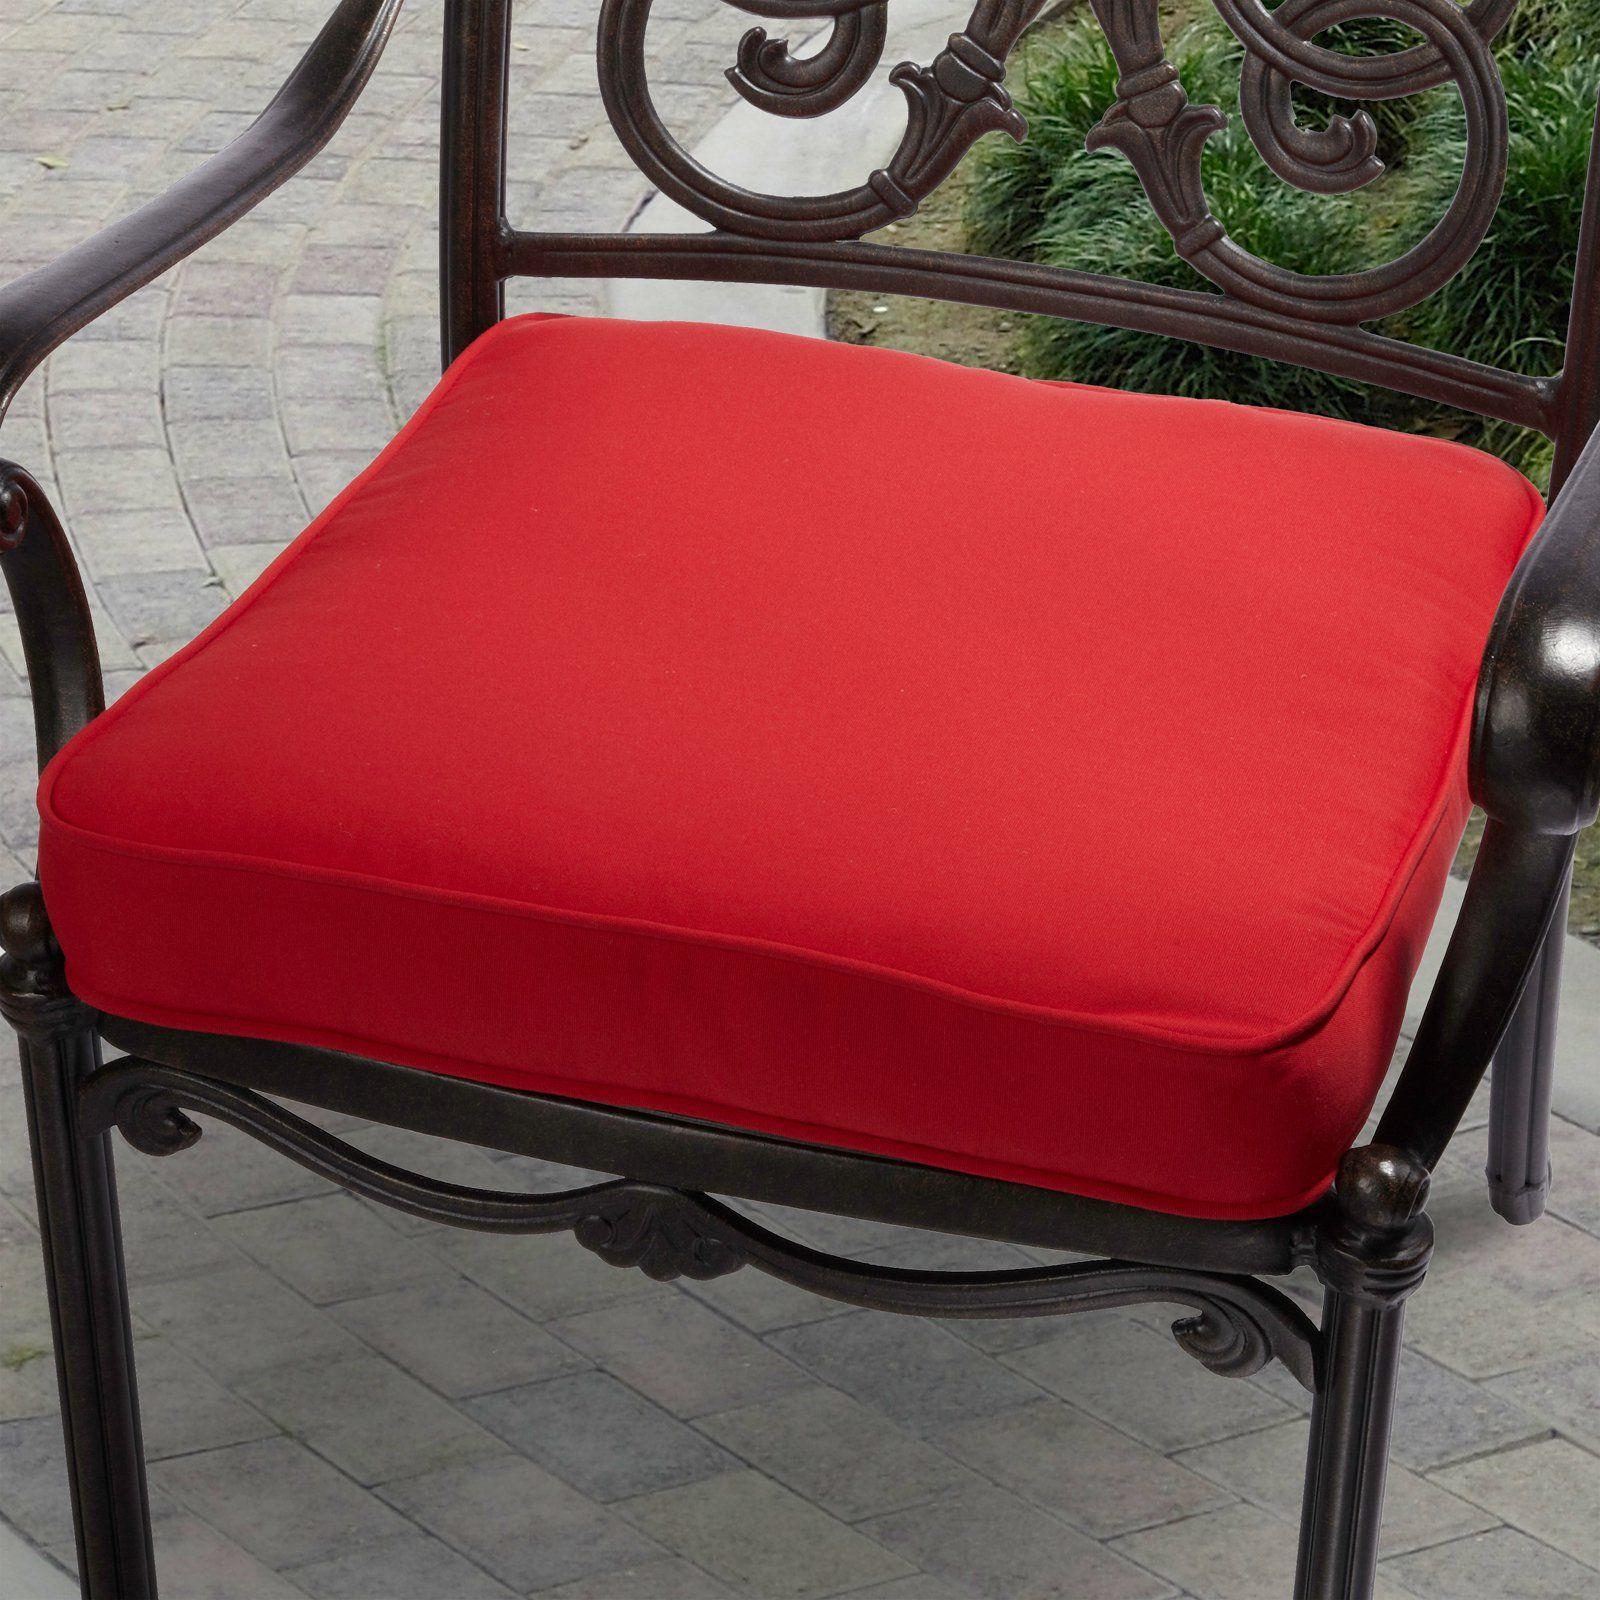 Mozaic Company Veranda Outdoor Corded Chair Cushion Outdoor Seat Cushions Indoor Outdoor Chair Outdoor Chair Cushions